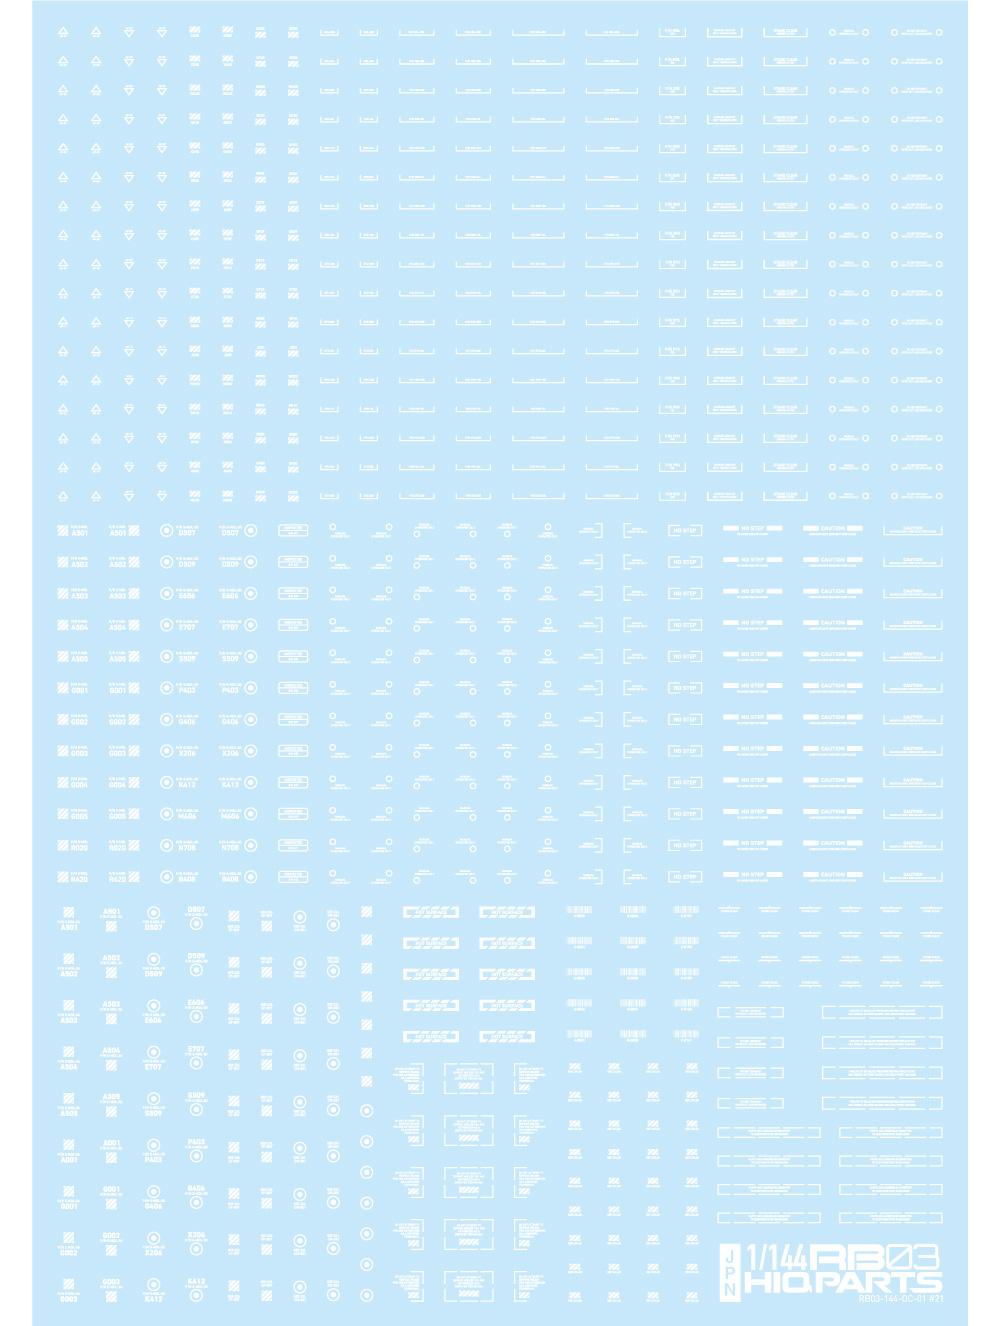 1/144 RB コーションデカール 03 ワンカラー ホワイトデカール(HIQパーツデカールNo.RB03-144OWH)商品画像_1